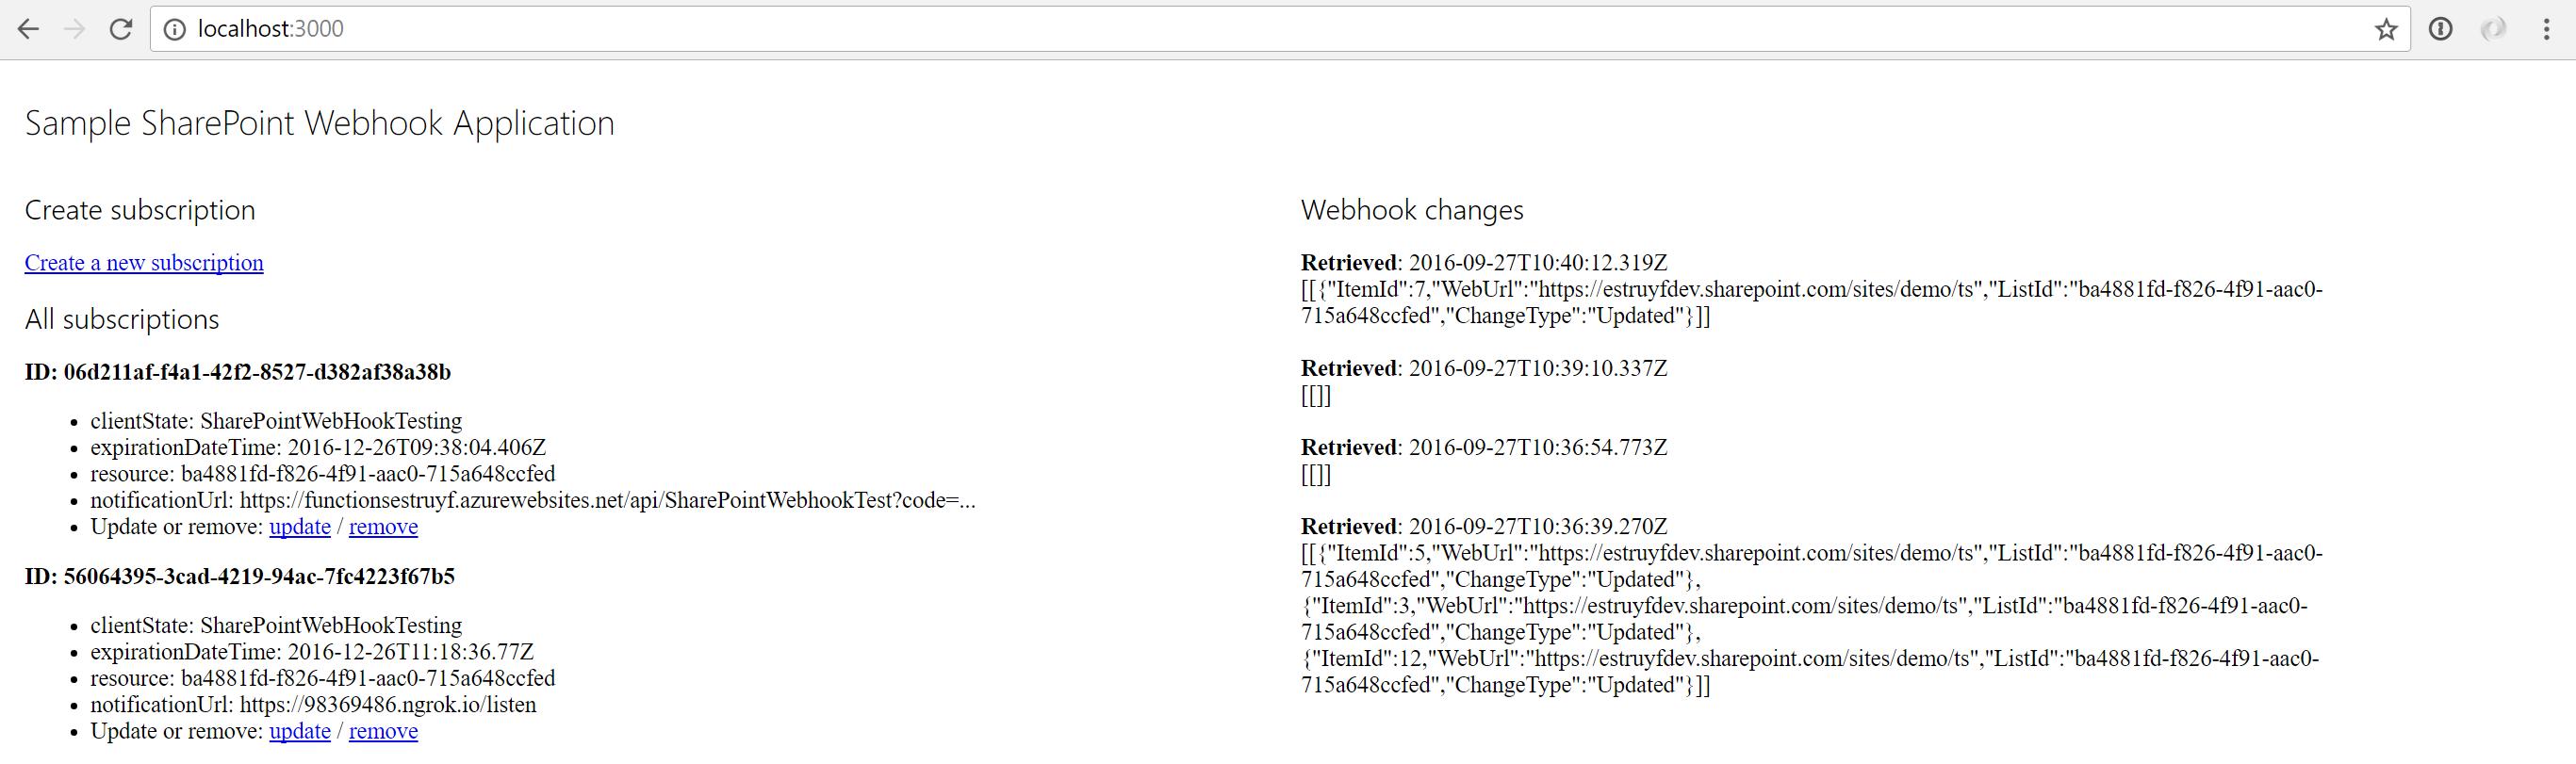 Webhook application